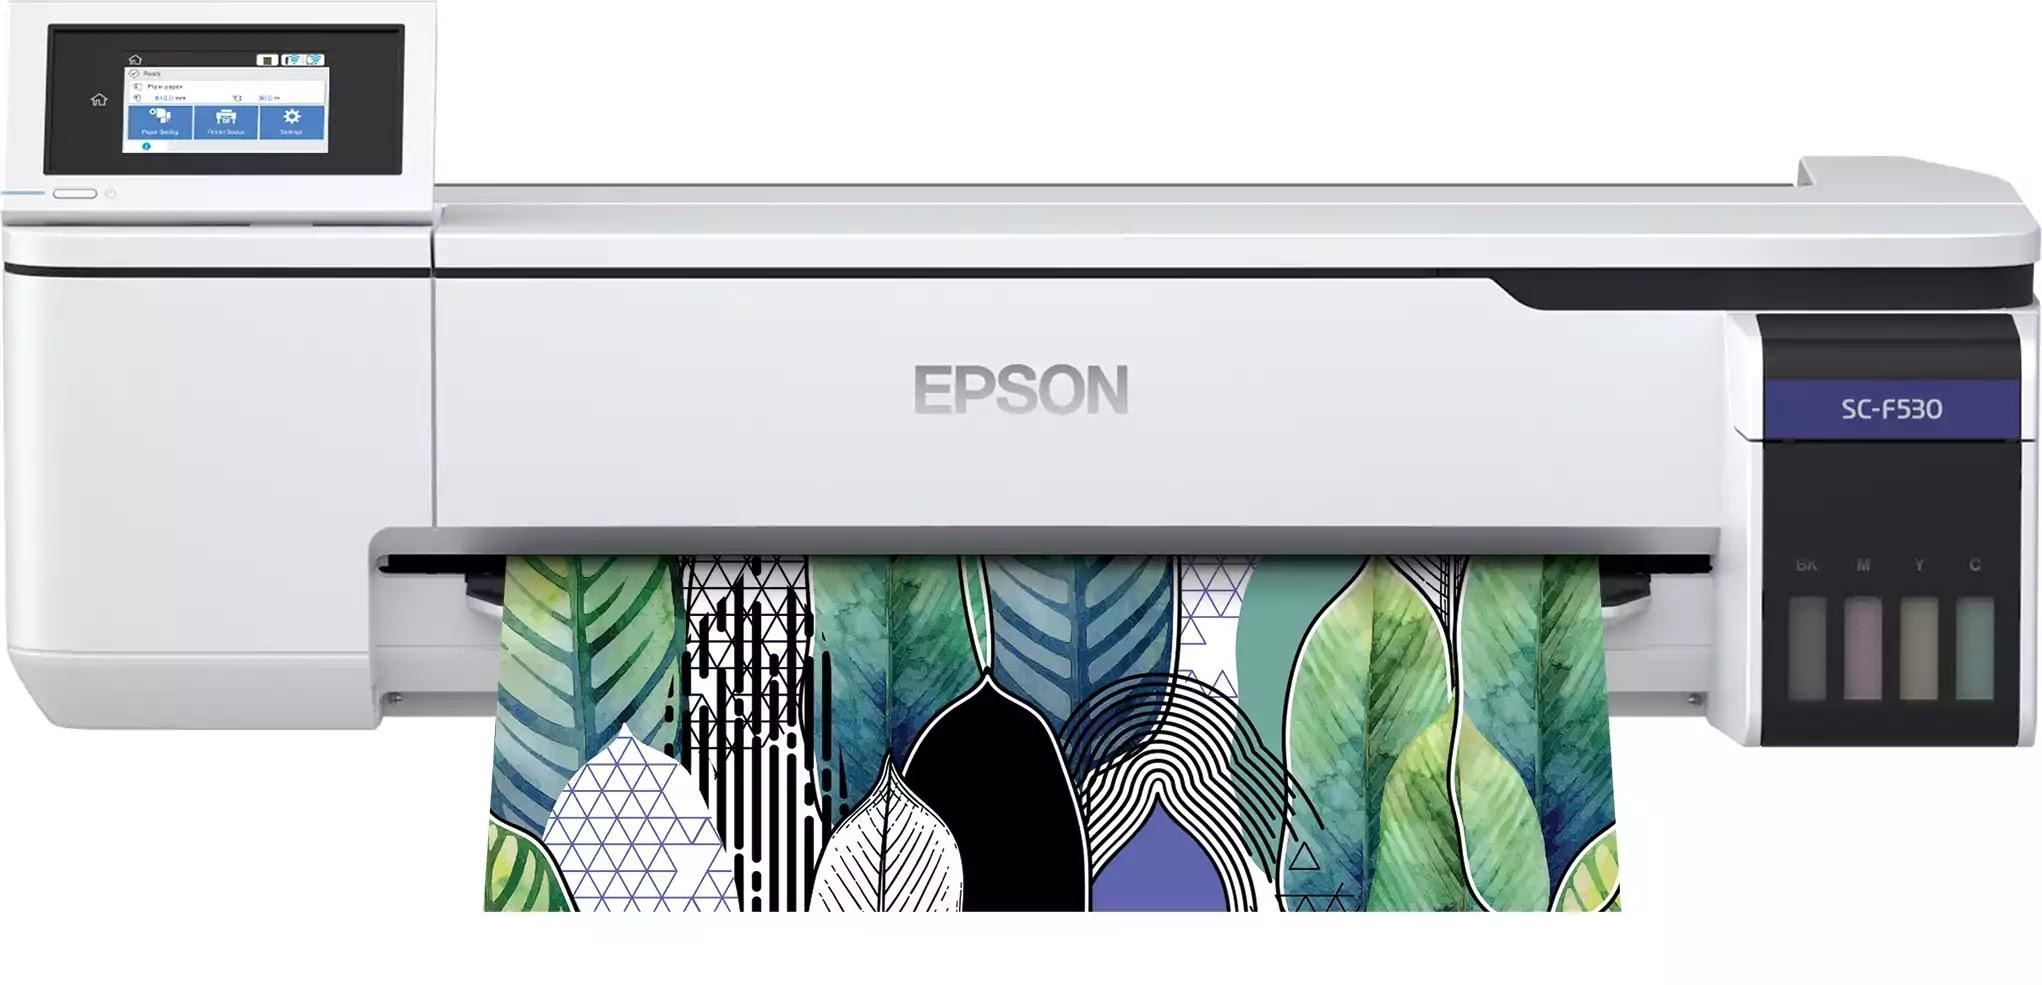 Epson SC-F530